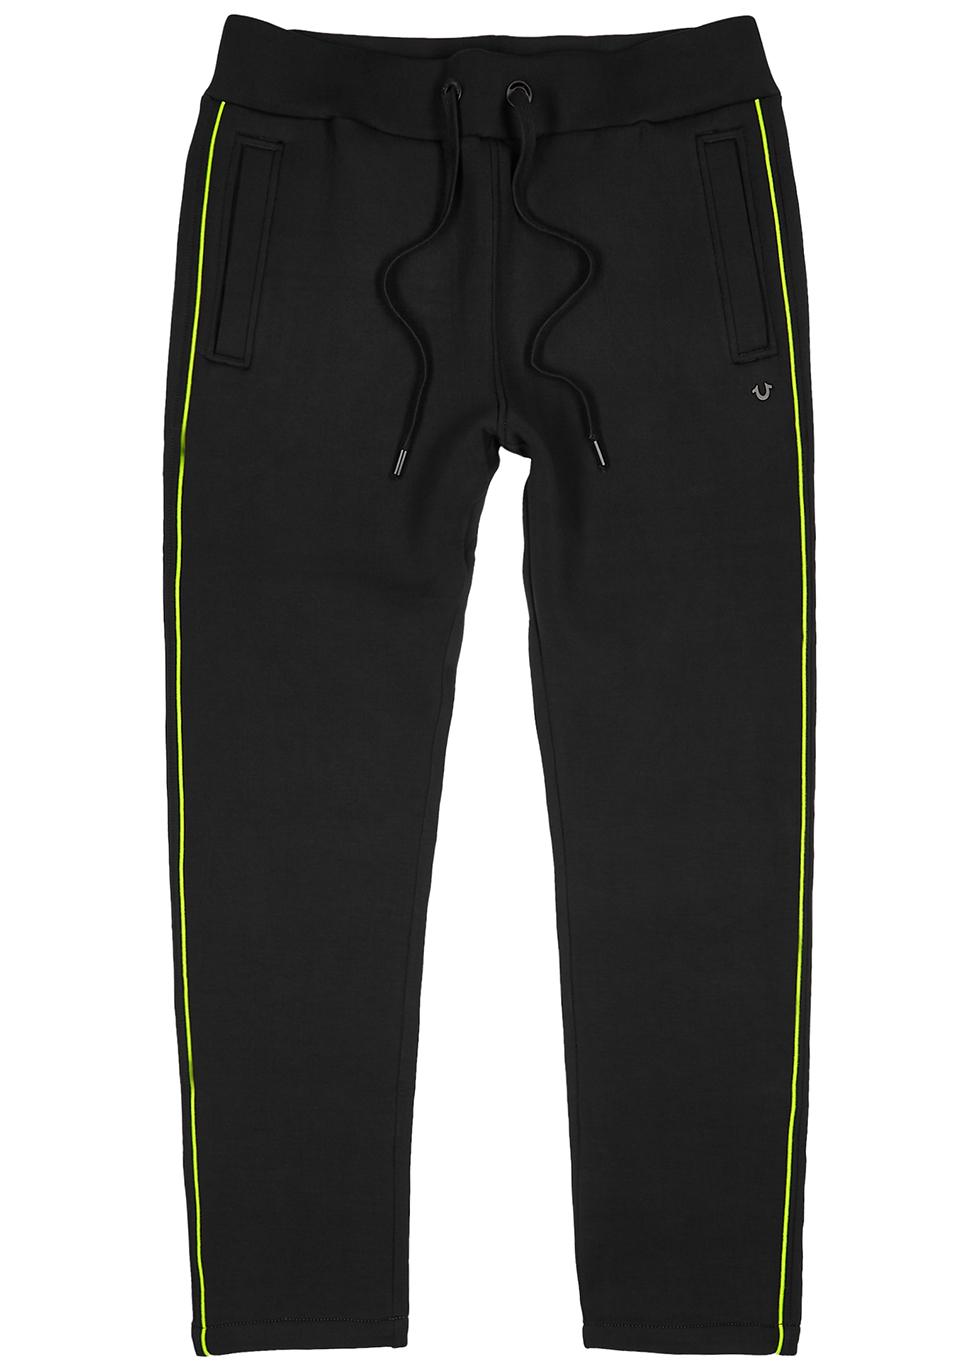 Black neoprene sweatpants